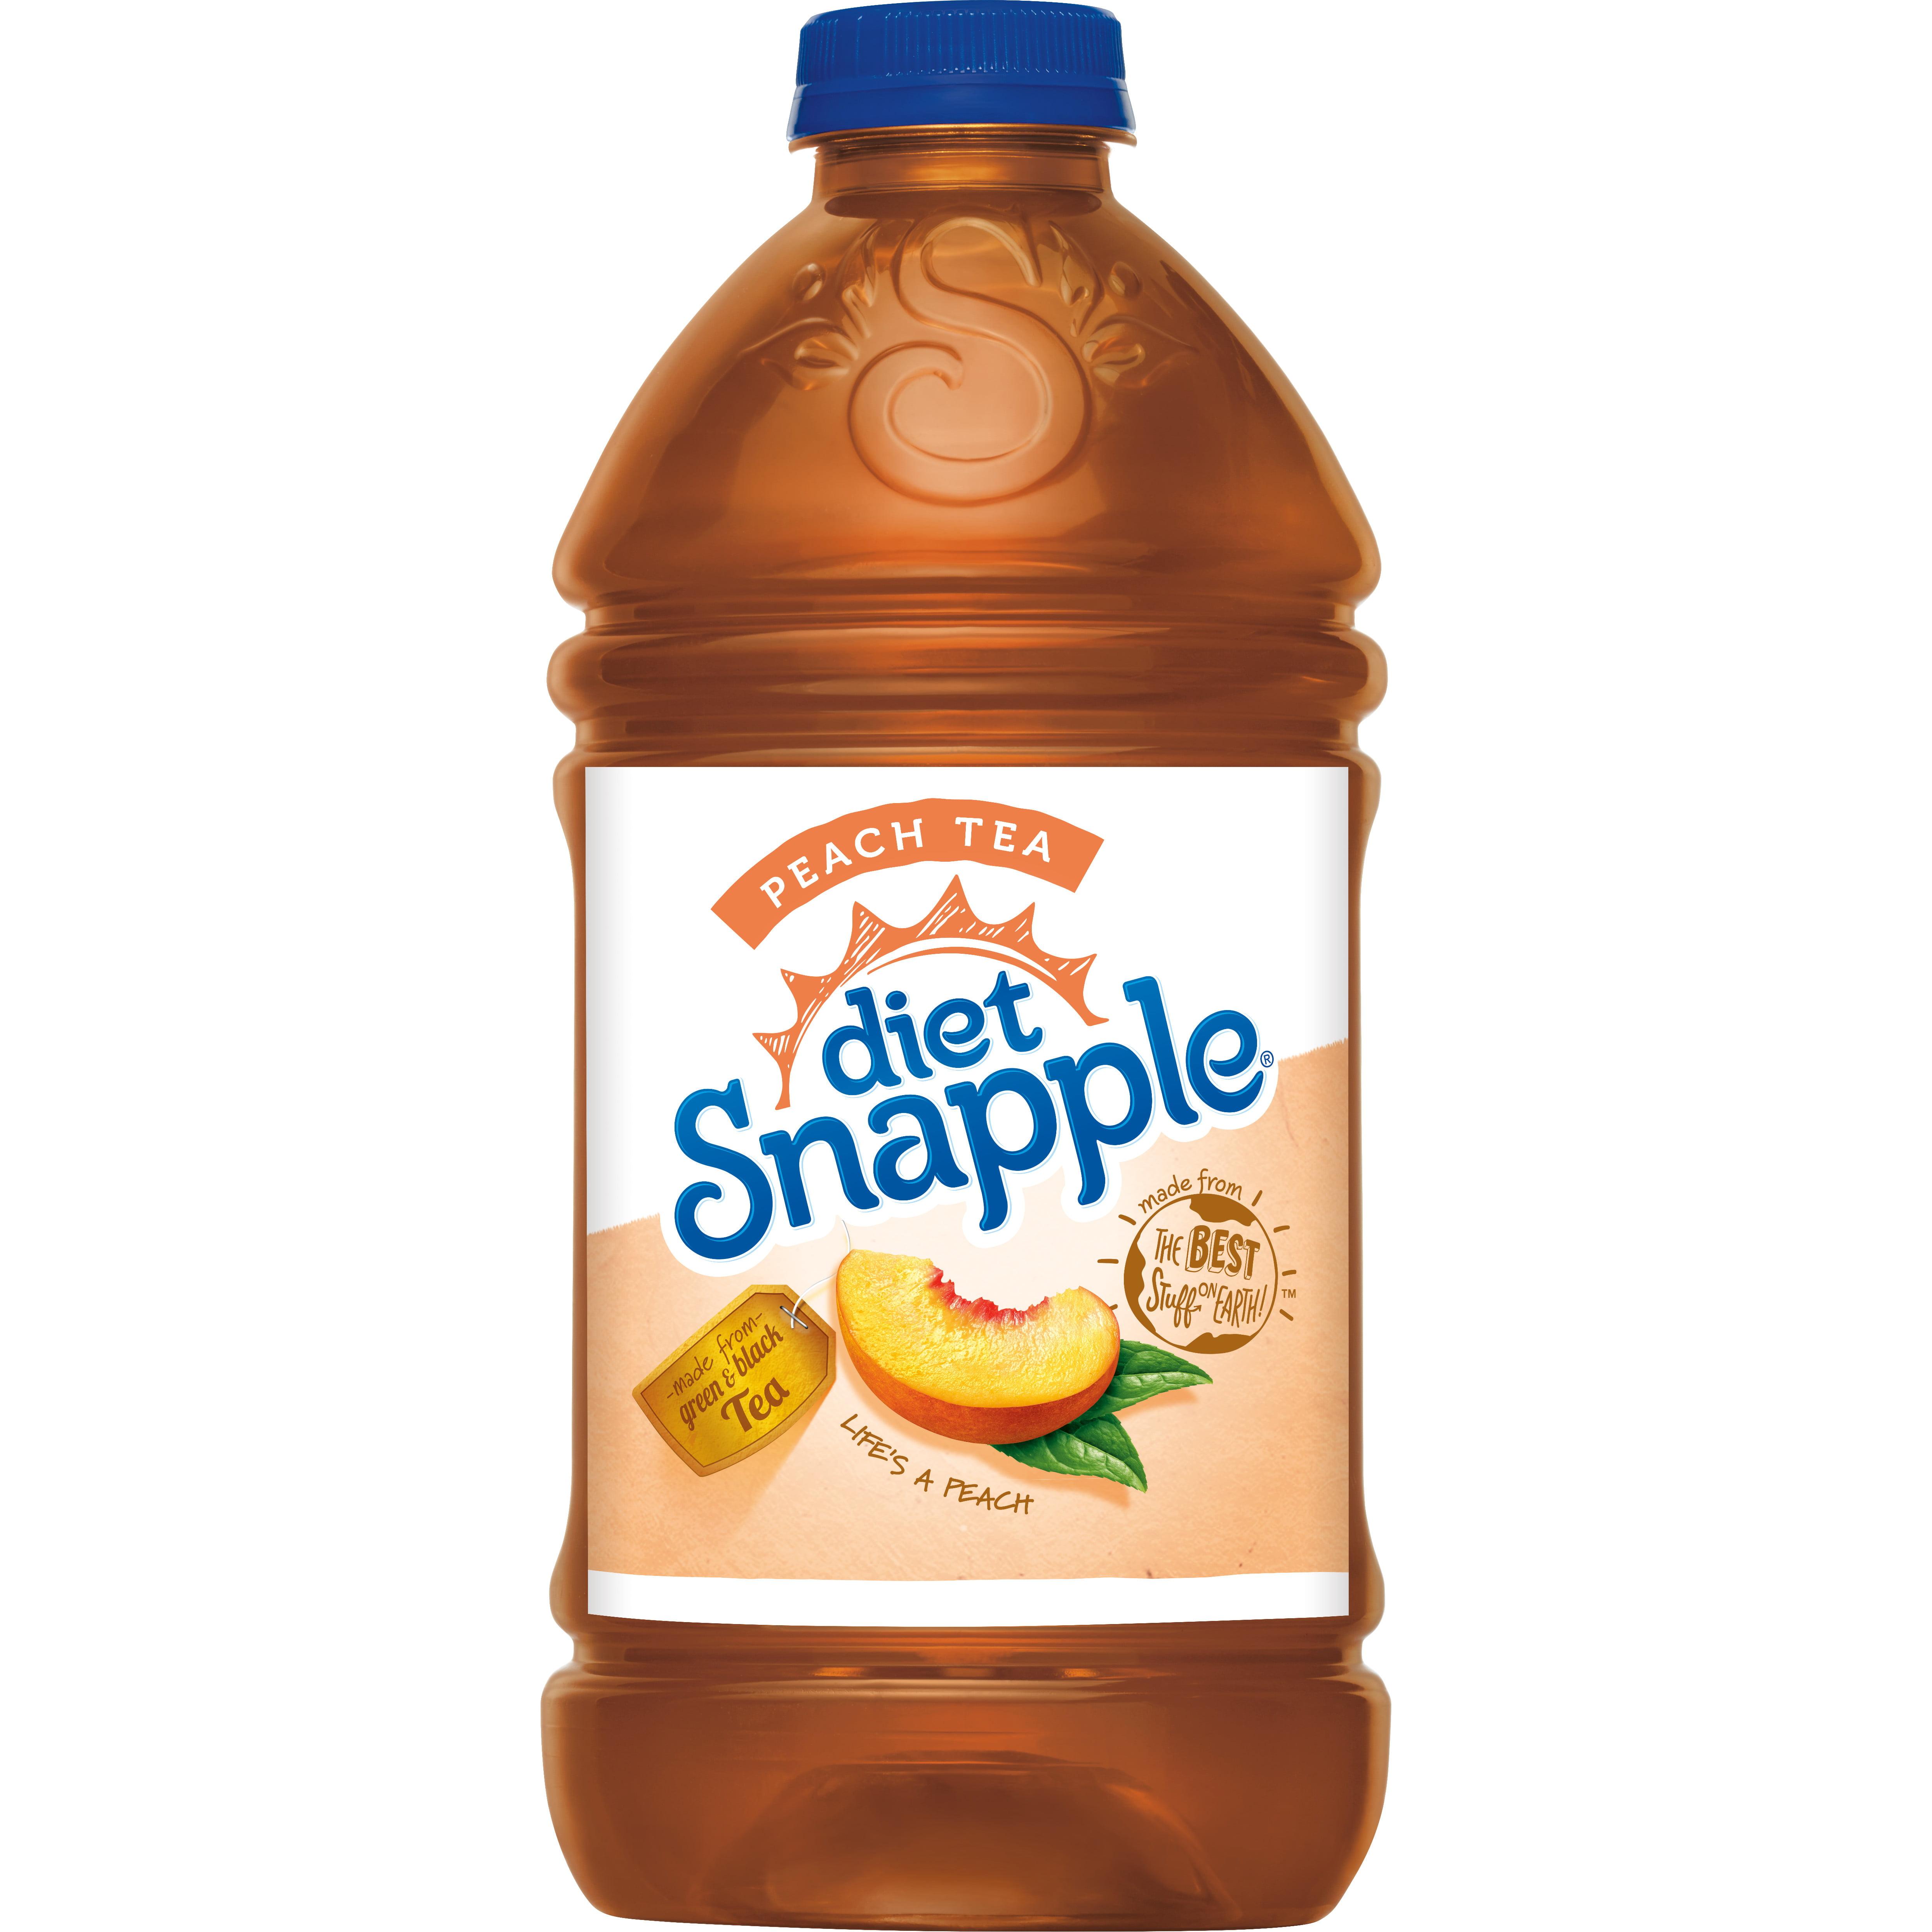 how healthy is diet peach snapple tea